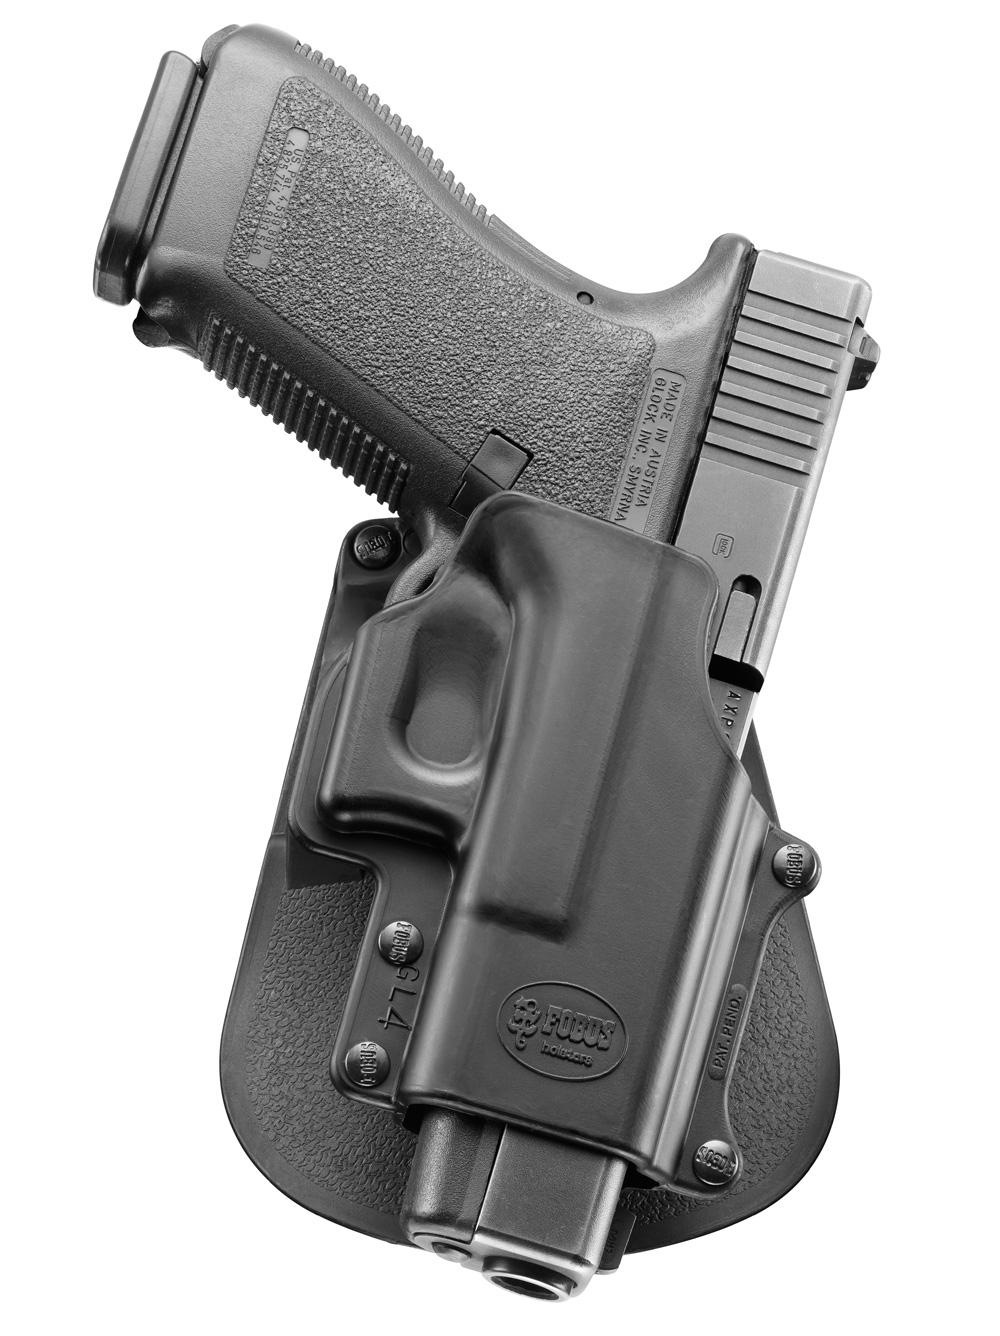 Fobus – Glock 21SF, 29, 30, 30SF, 39